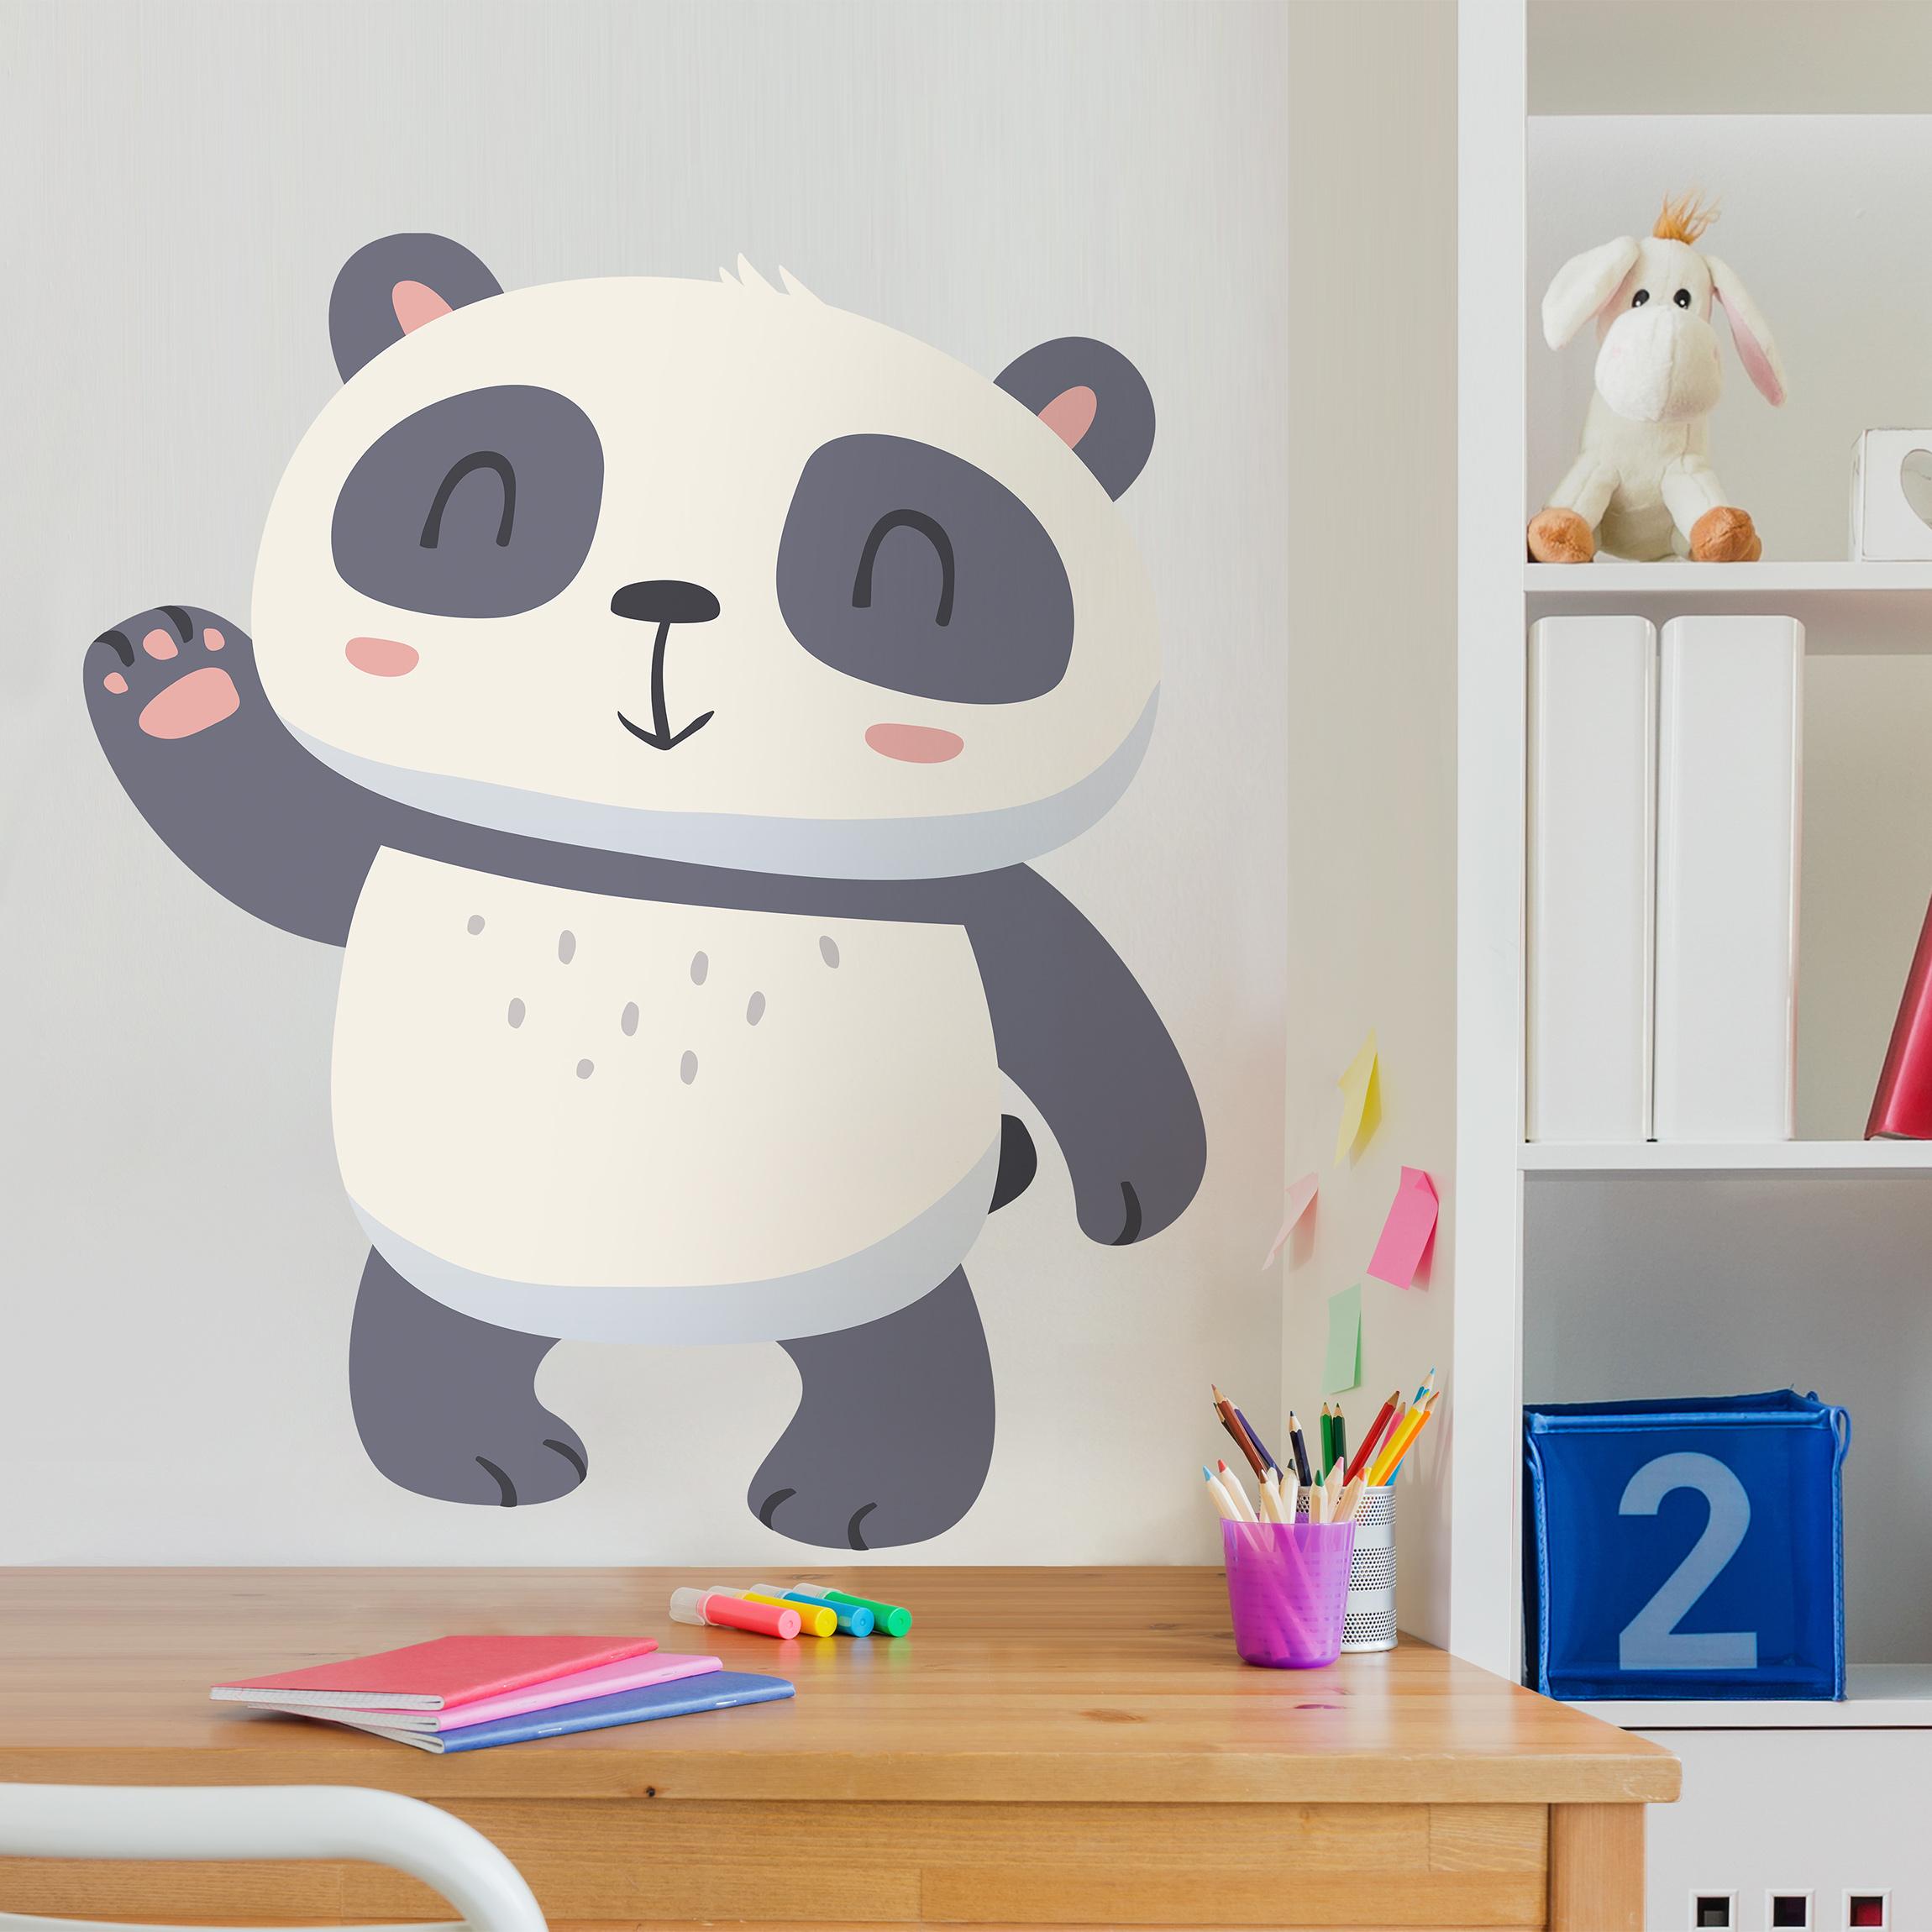 Wandtattoo kinderzimmer winkender panda - Wandtatoos kinderzimmer ...